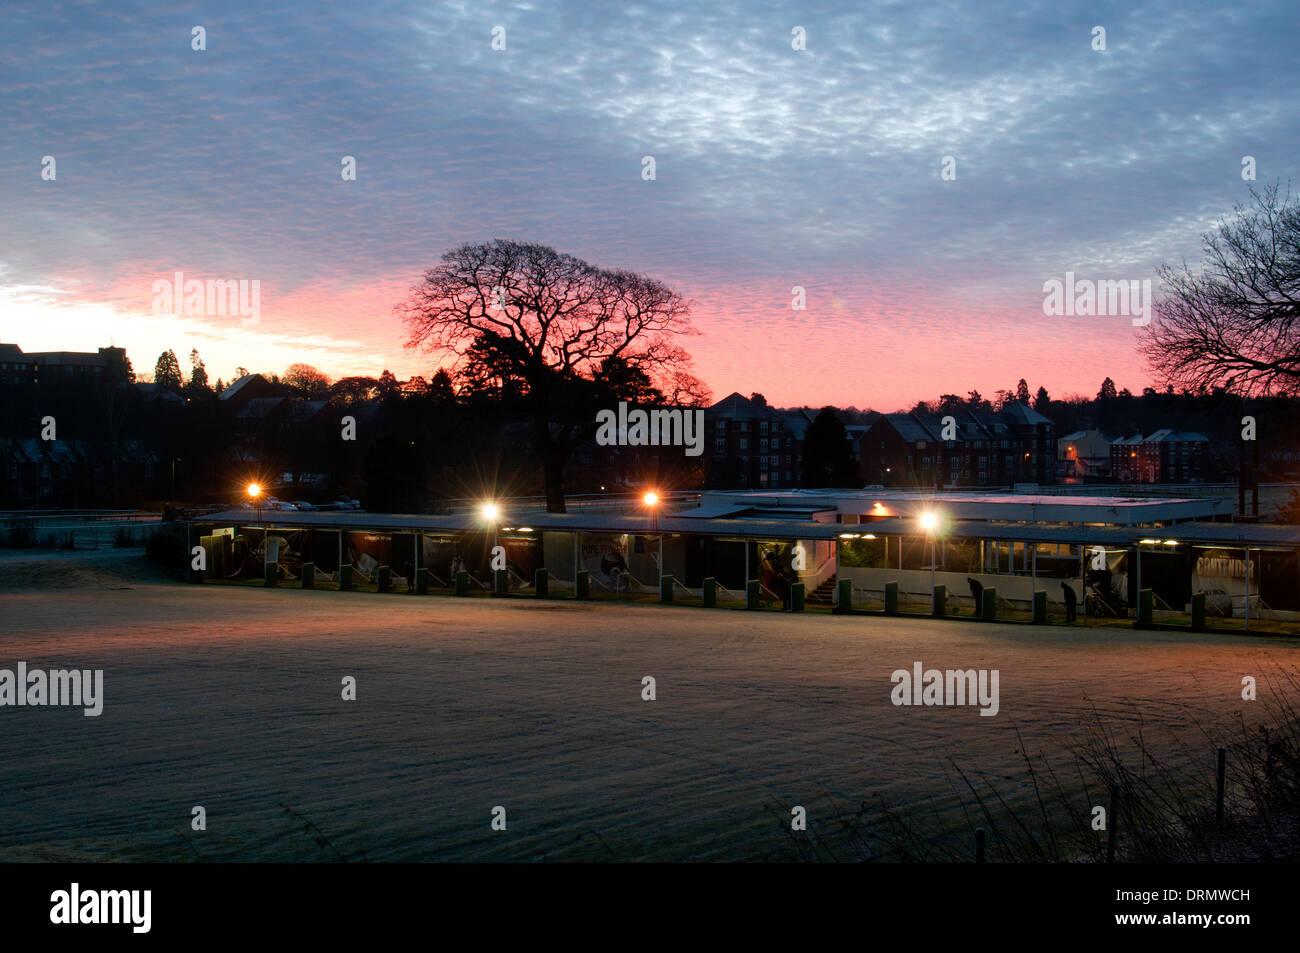 Warwick golf driving range at dawn, Warwick, Warwickshire, UK - Stock Image